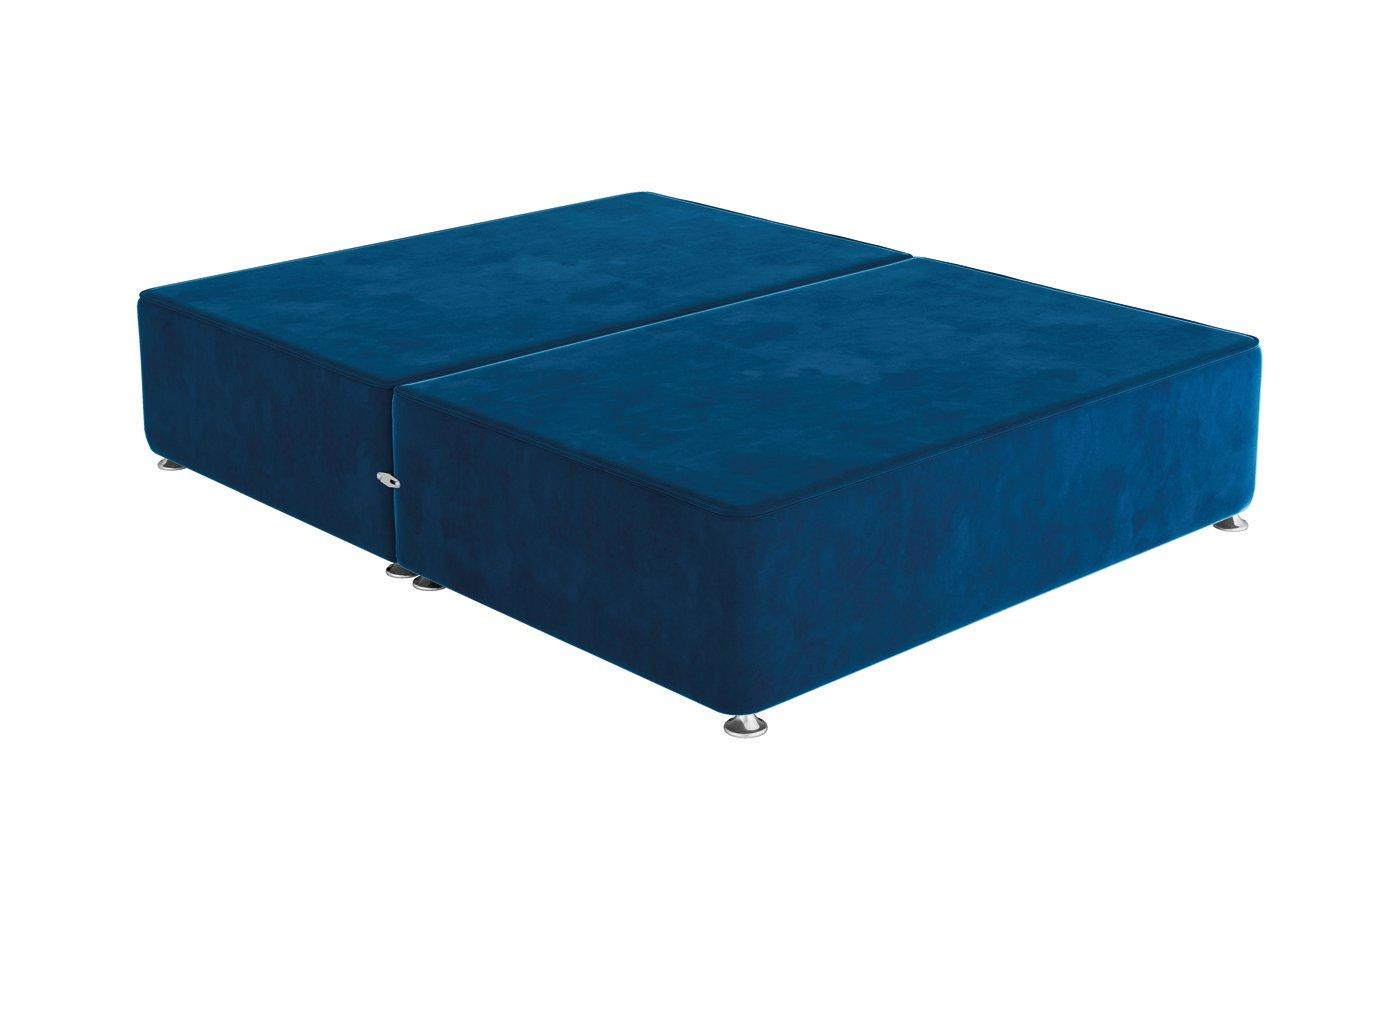 Sleepeezee 4'0 P/T 0 Drw Base Plush Navy 4'0 Small double BLUE